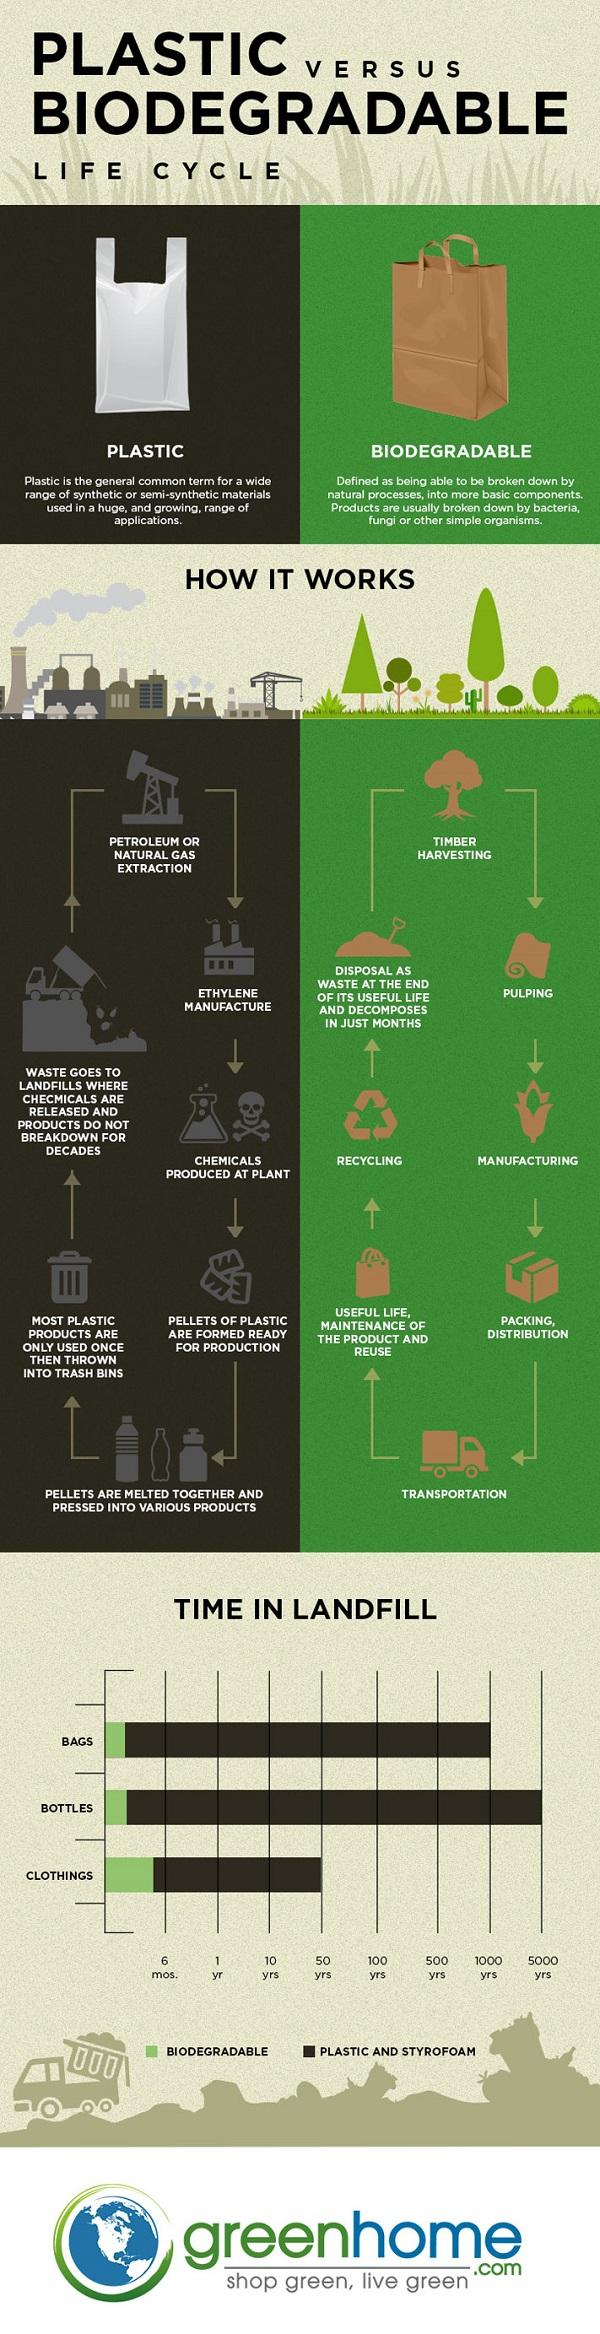 Biodegradable alternatives to plastic